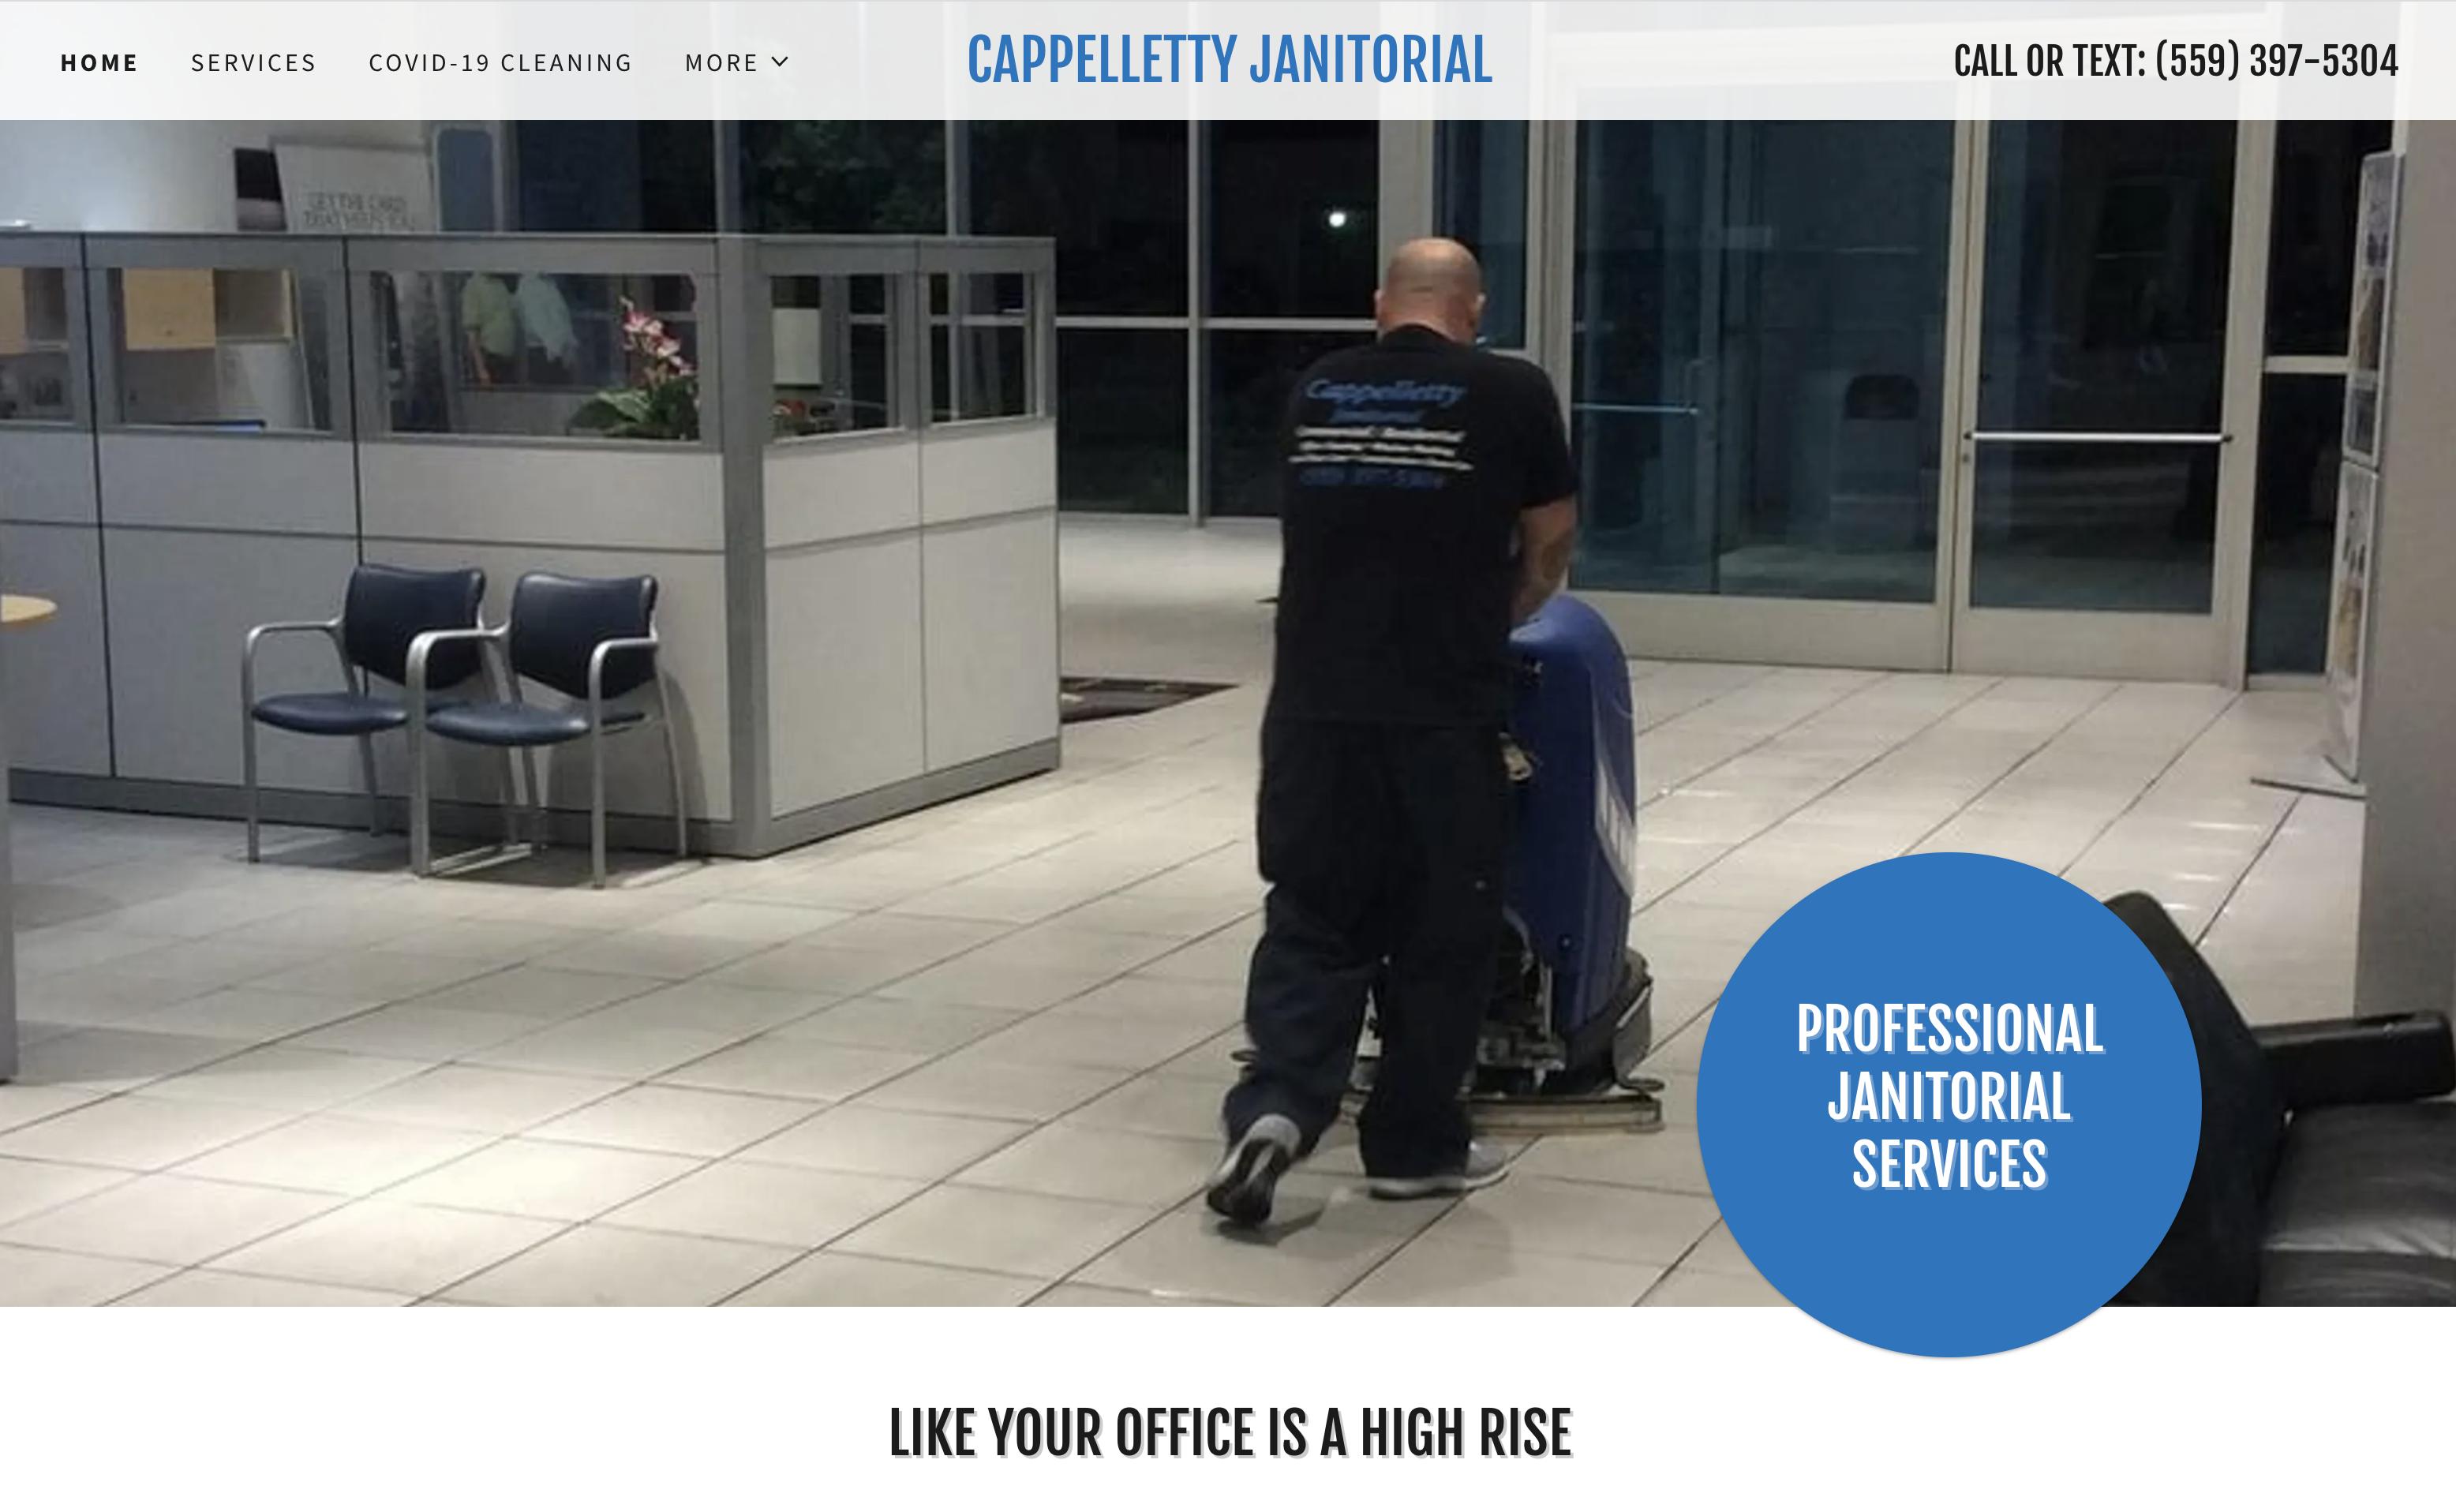 Man pushing floor cleaner.